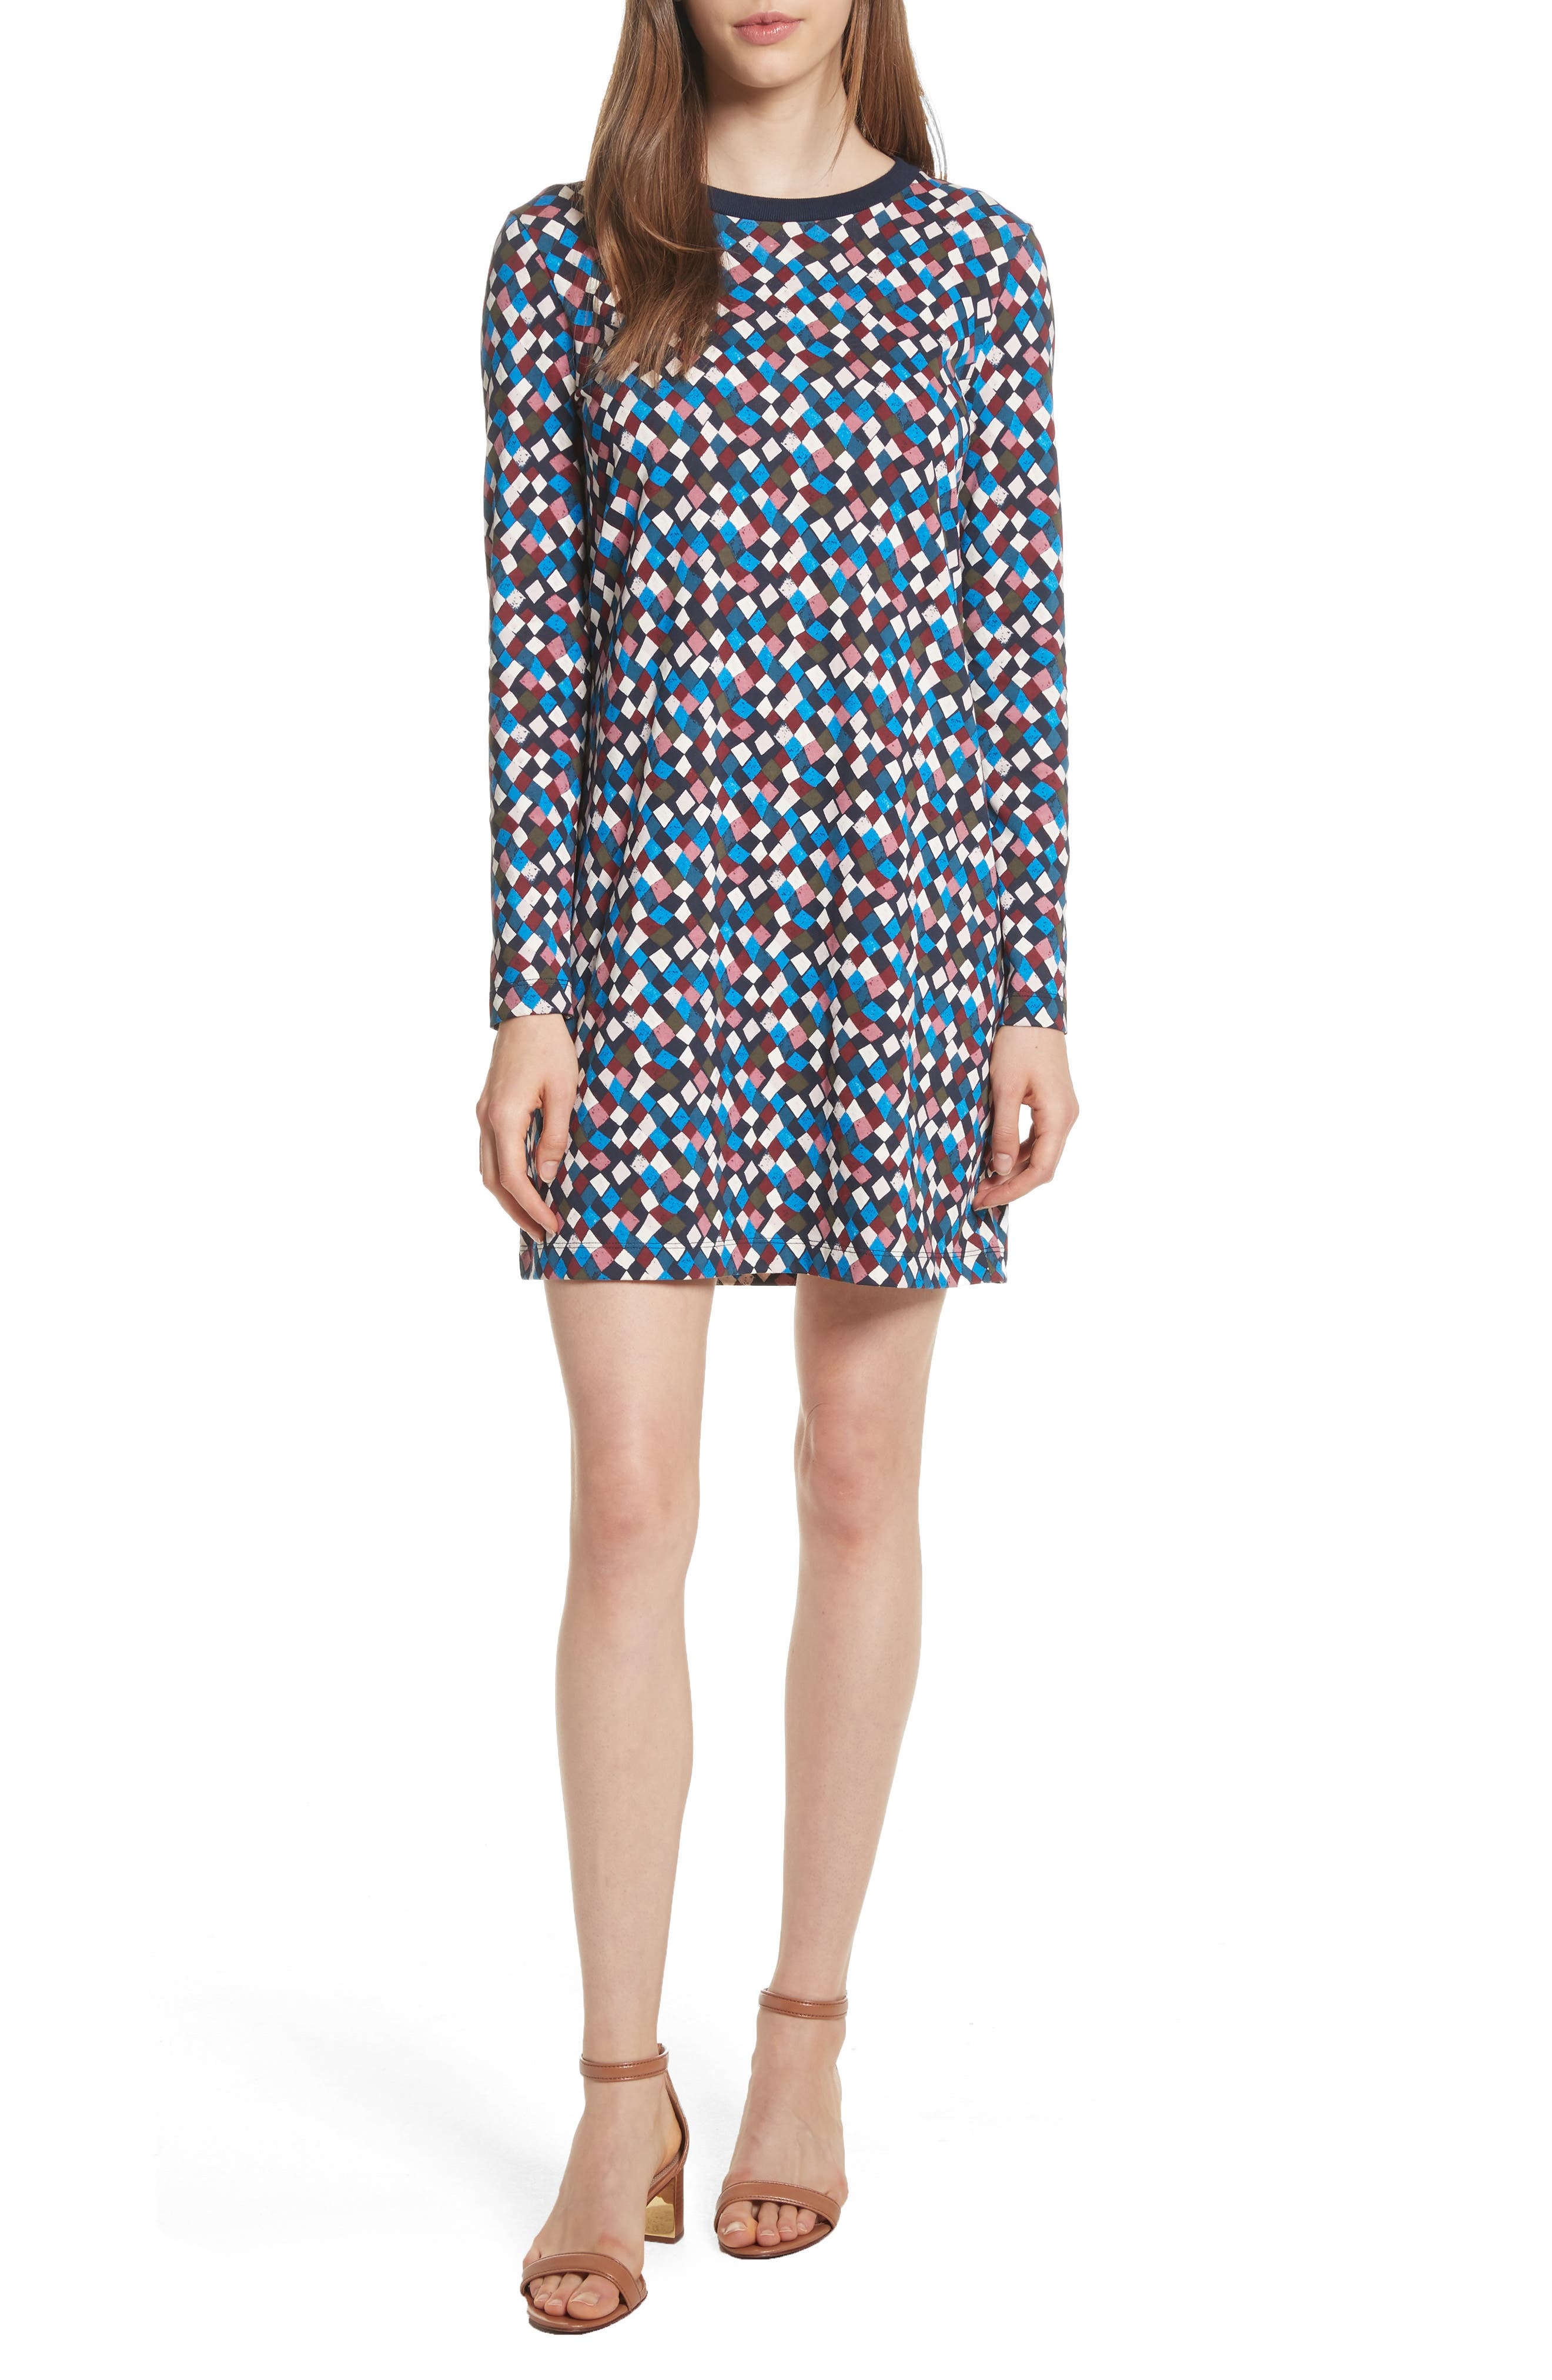 Tory Burch Maggie Print Cotton Shift Dress